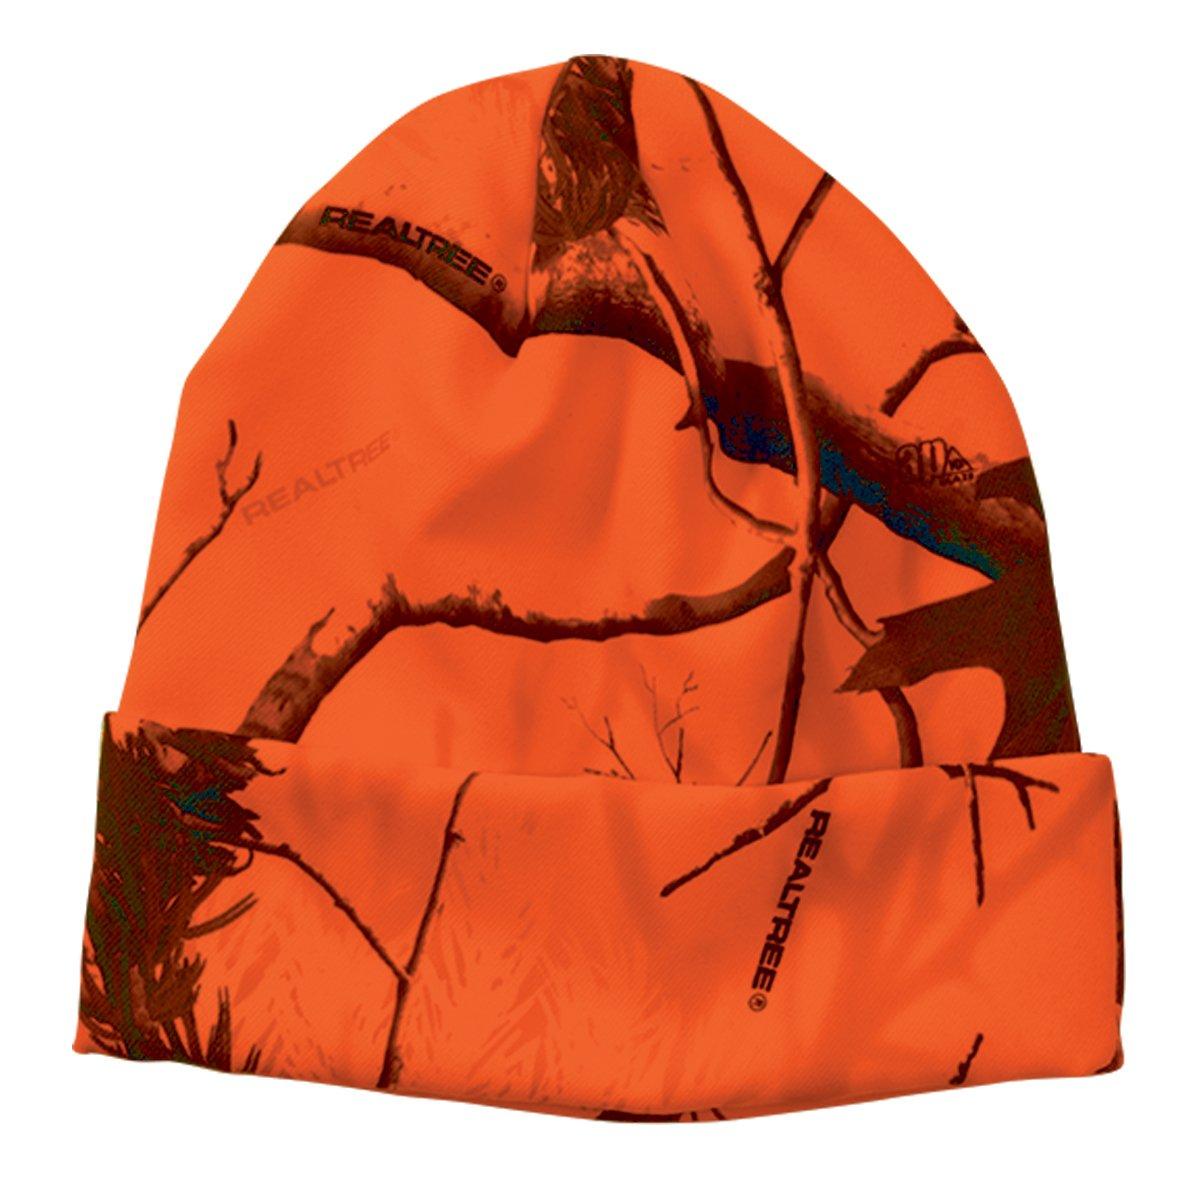 Realtree Licensed Camo Knit Cuff Beanie (Realtree Blaze Orange) by Realtree